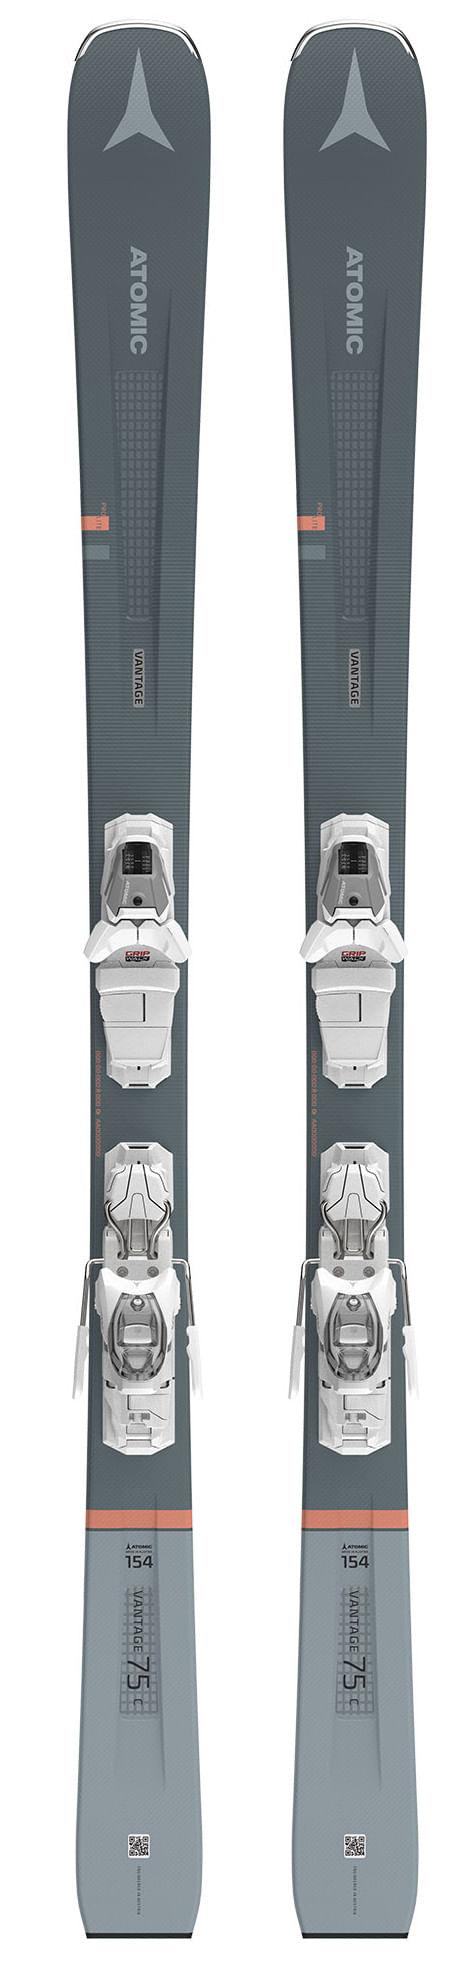 Atomic-Vantage-75-C-Women-s-Ski-with-M10-GripWalk-Bindings-2021